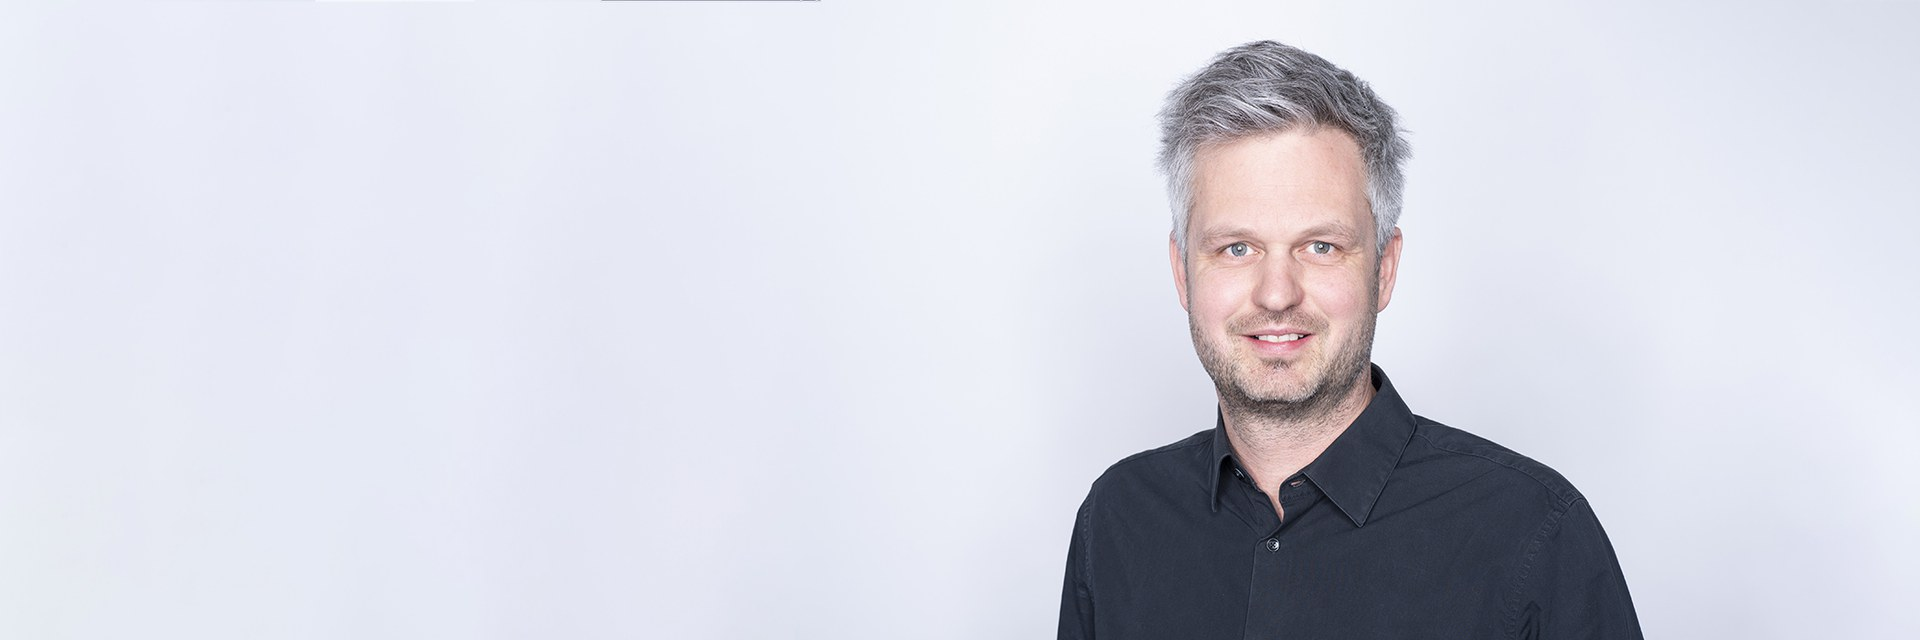 Matthias Günthart